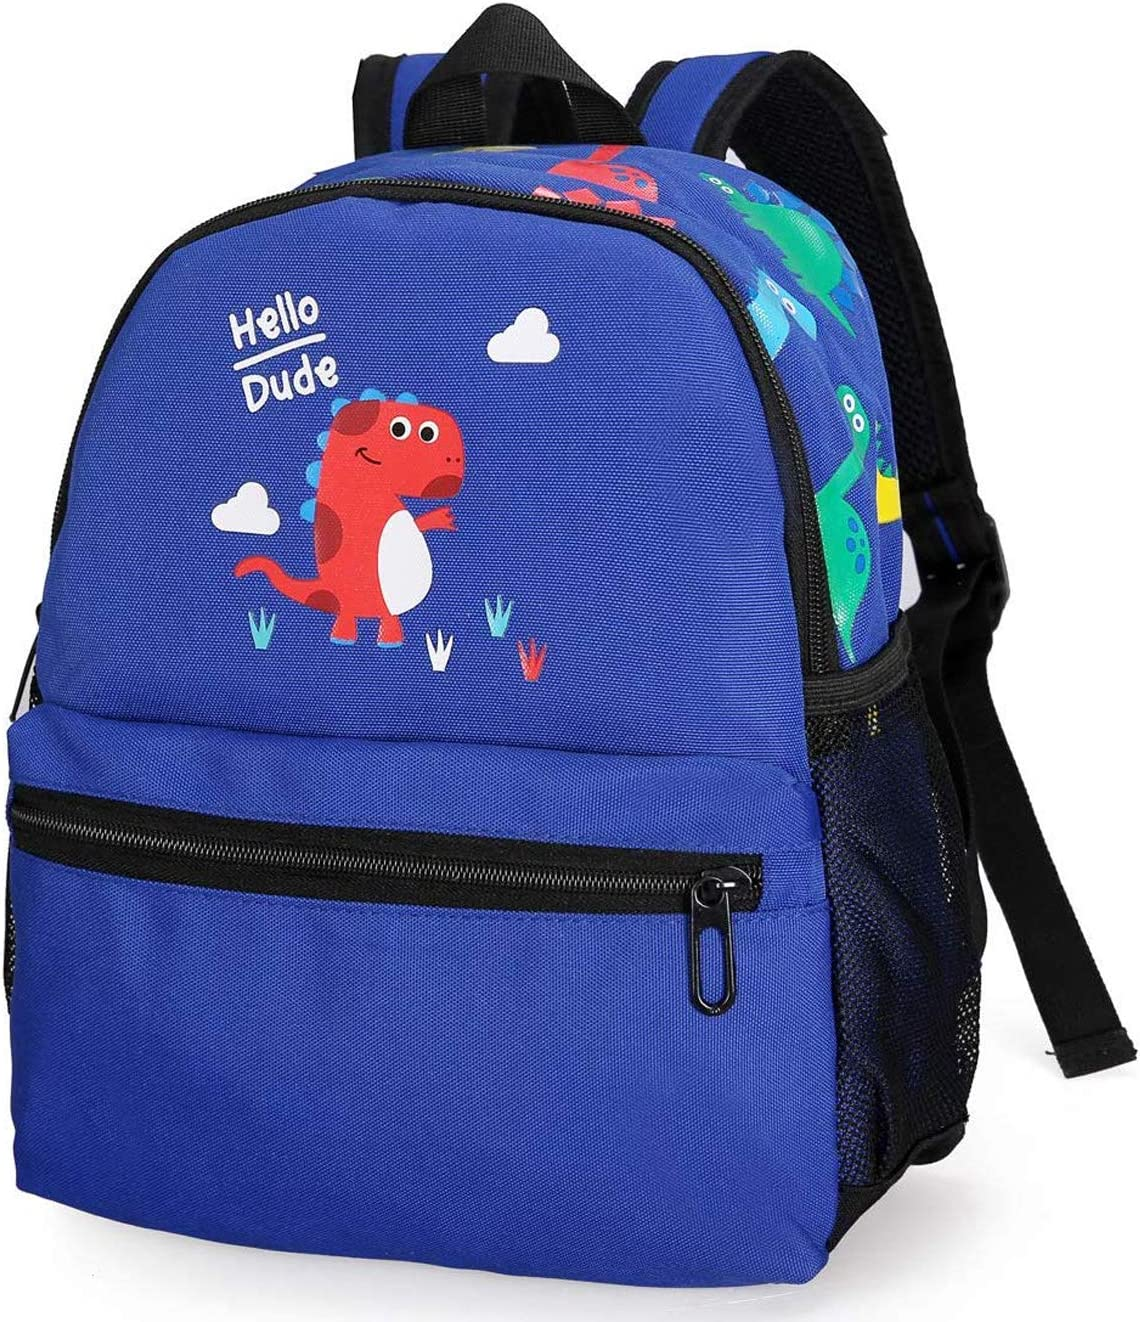 Kindergarten Children Kid Boys Girls Dinosaur Backpack School Bag Rucksack Cute